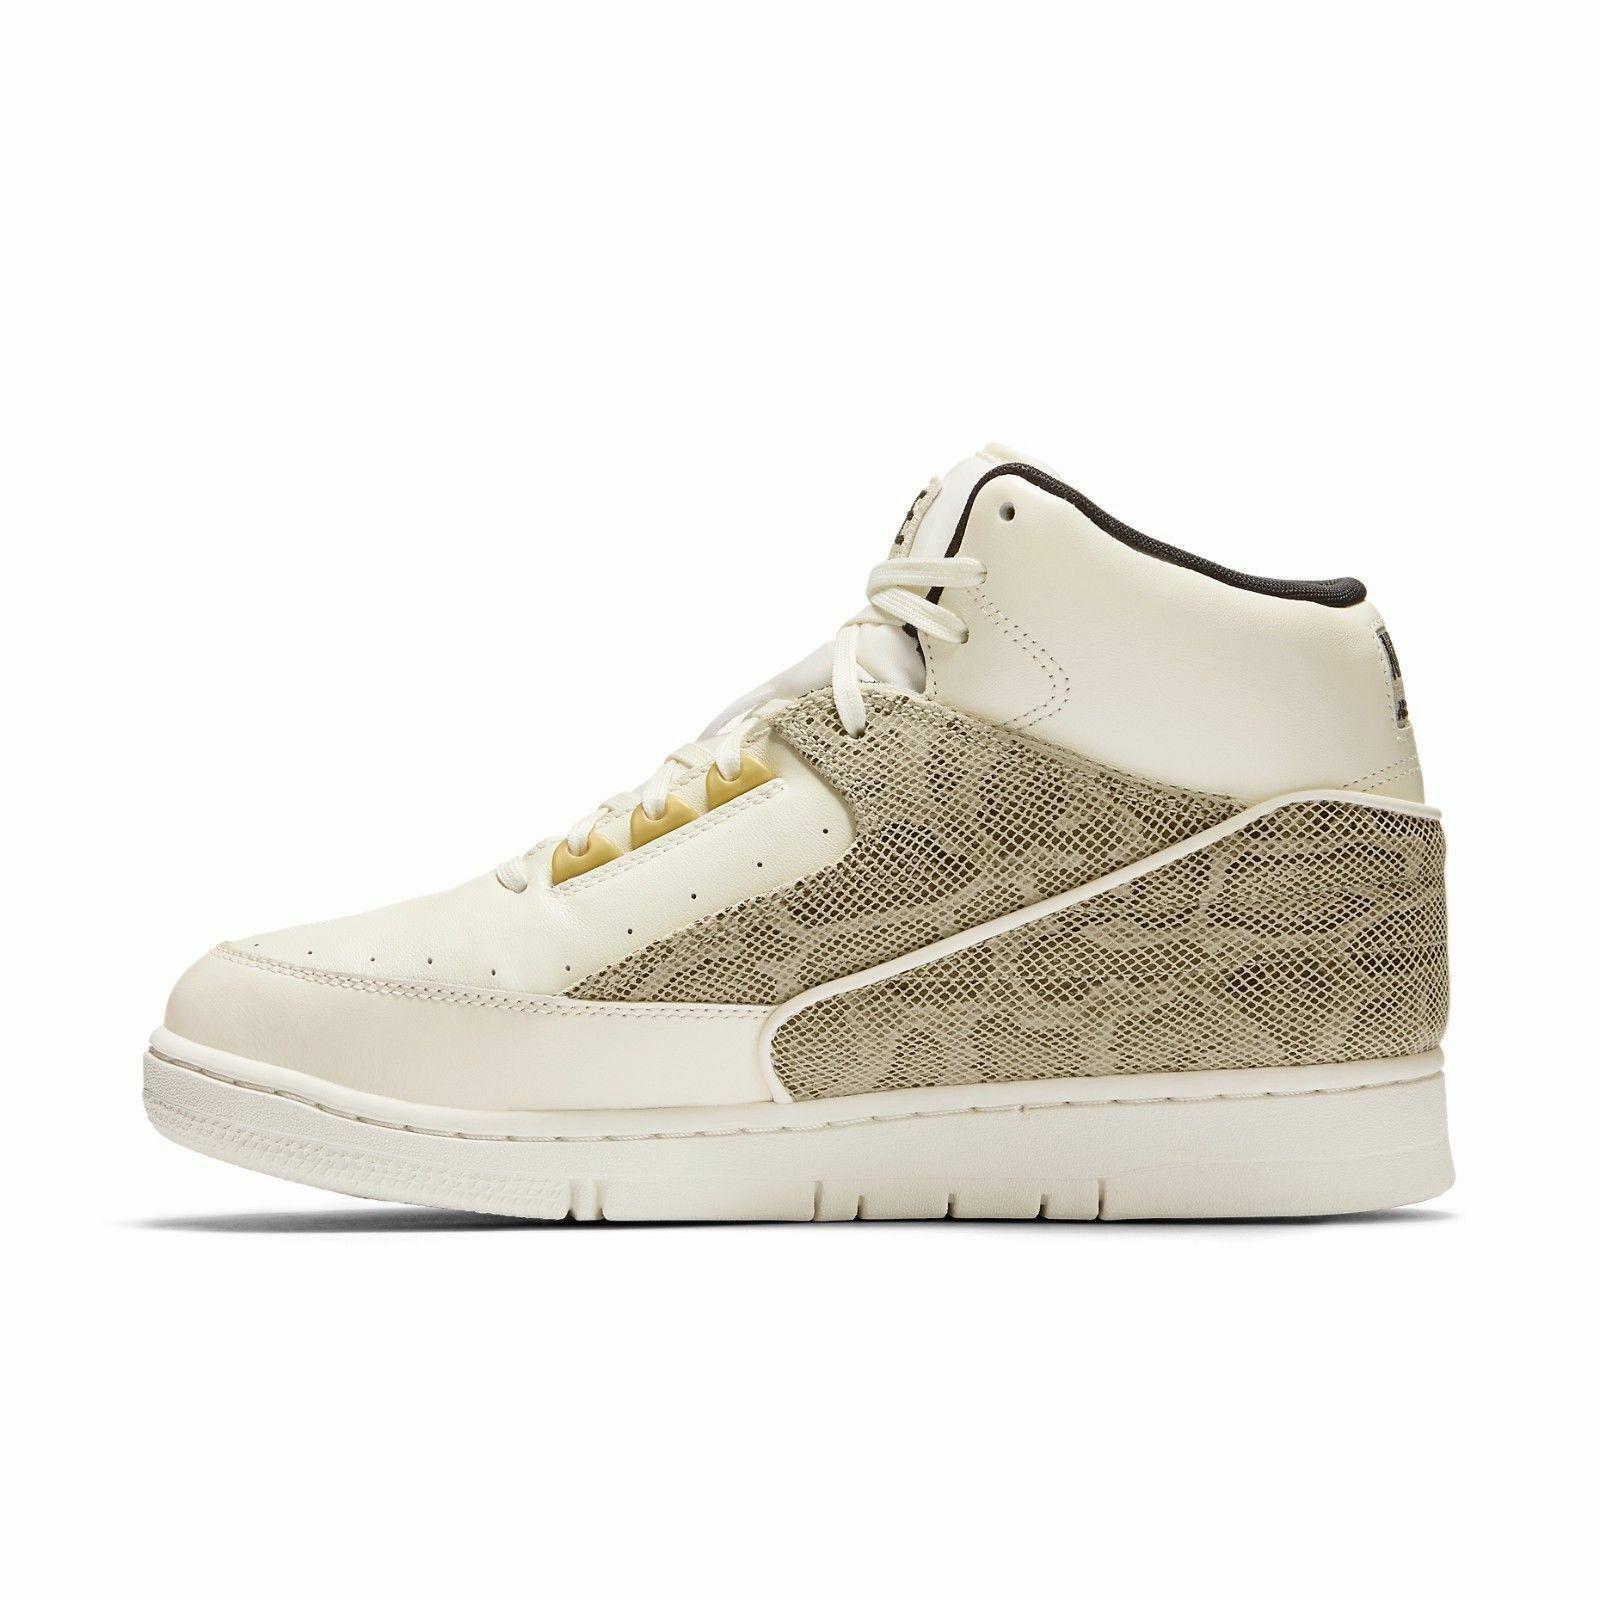 New Nike Men's Air Python Shoes (705067-100)  Sail / Metallic Gold-Black